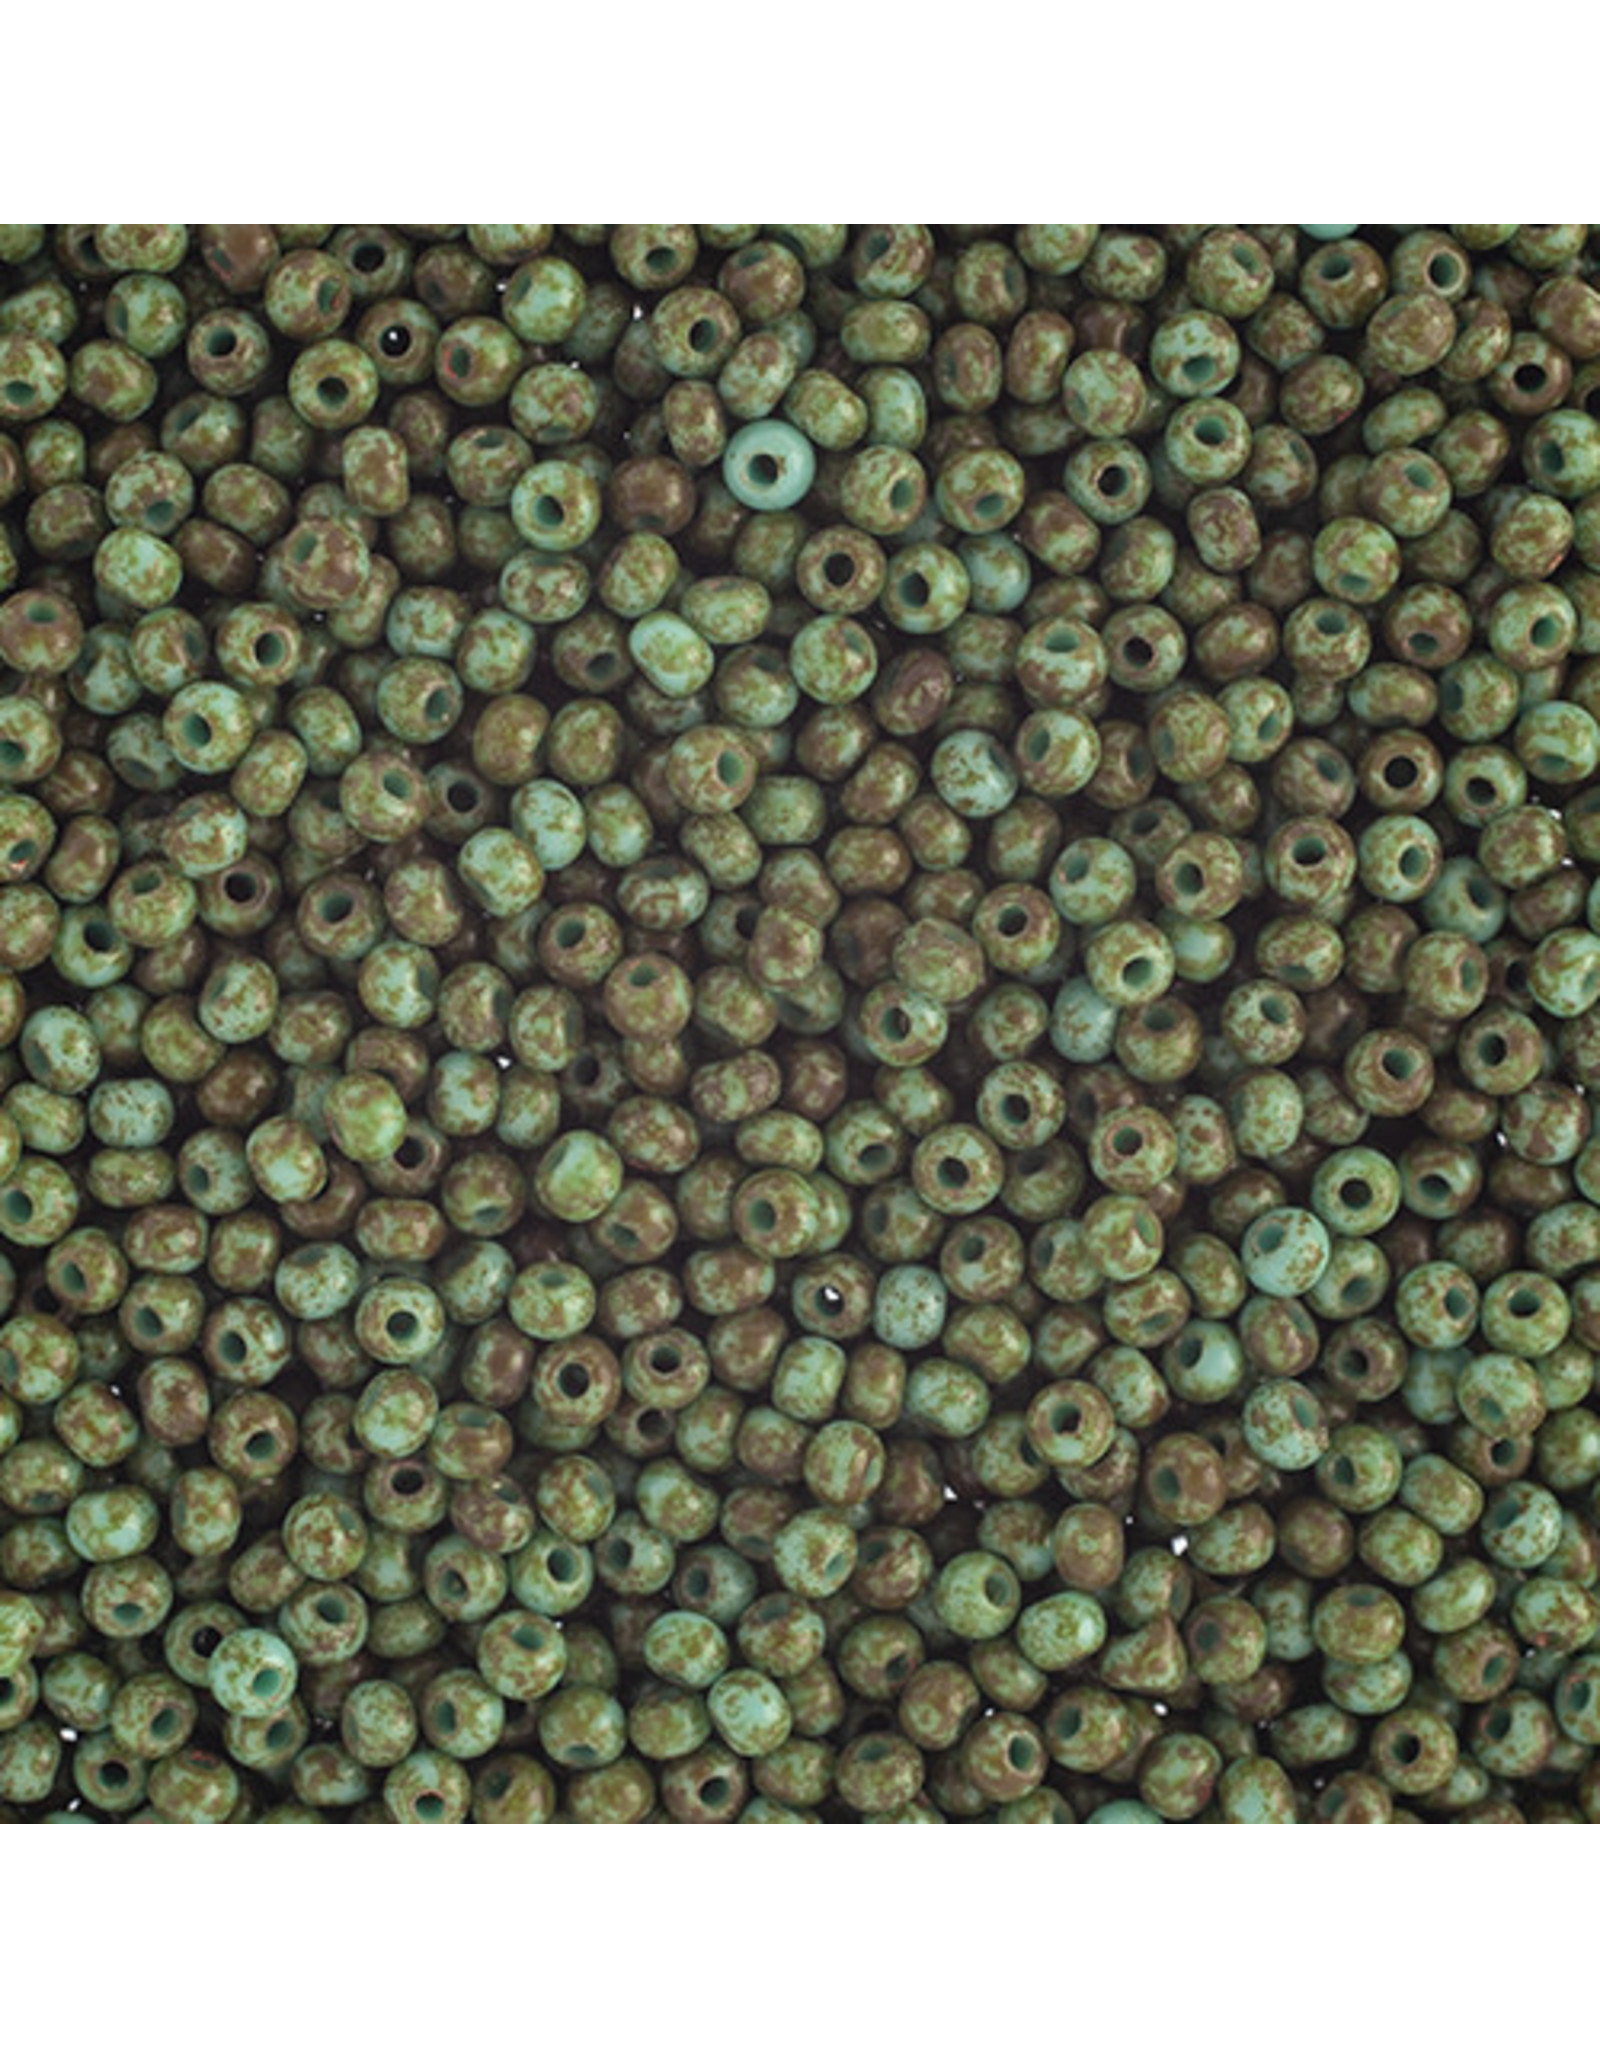 Czech *1523B 10   Seed 125g Opaque Turquoise Travertine